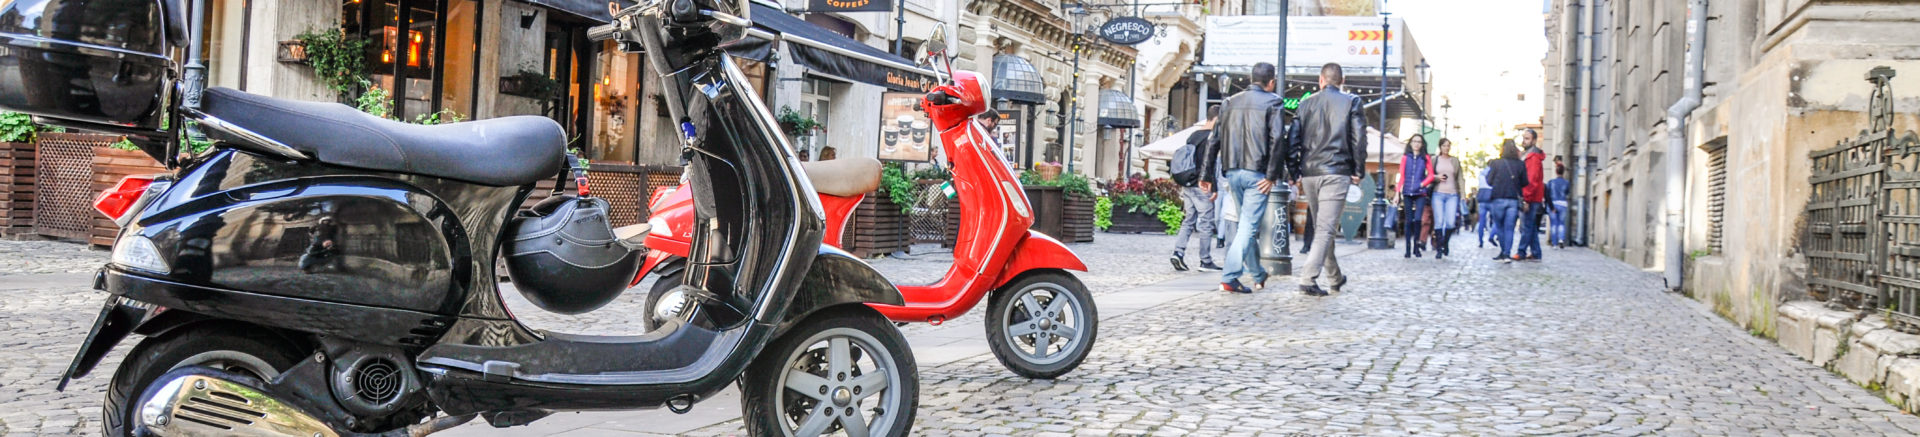 Rent Scooter Bucharest